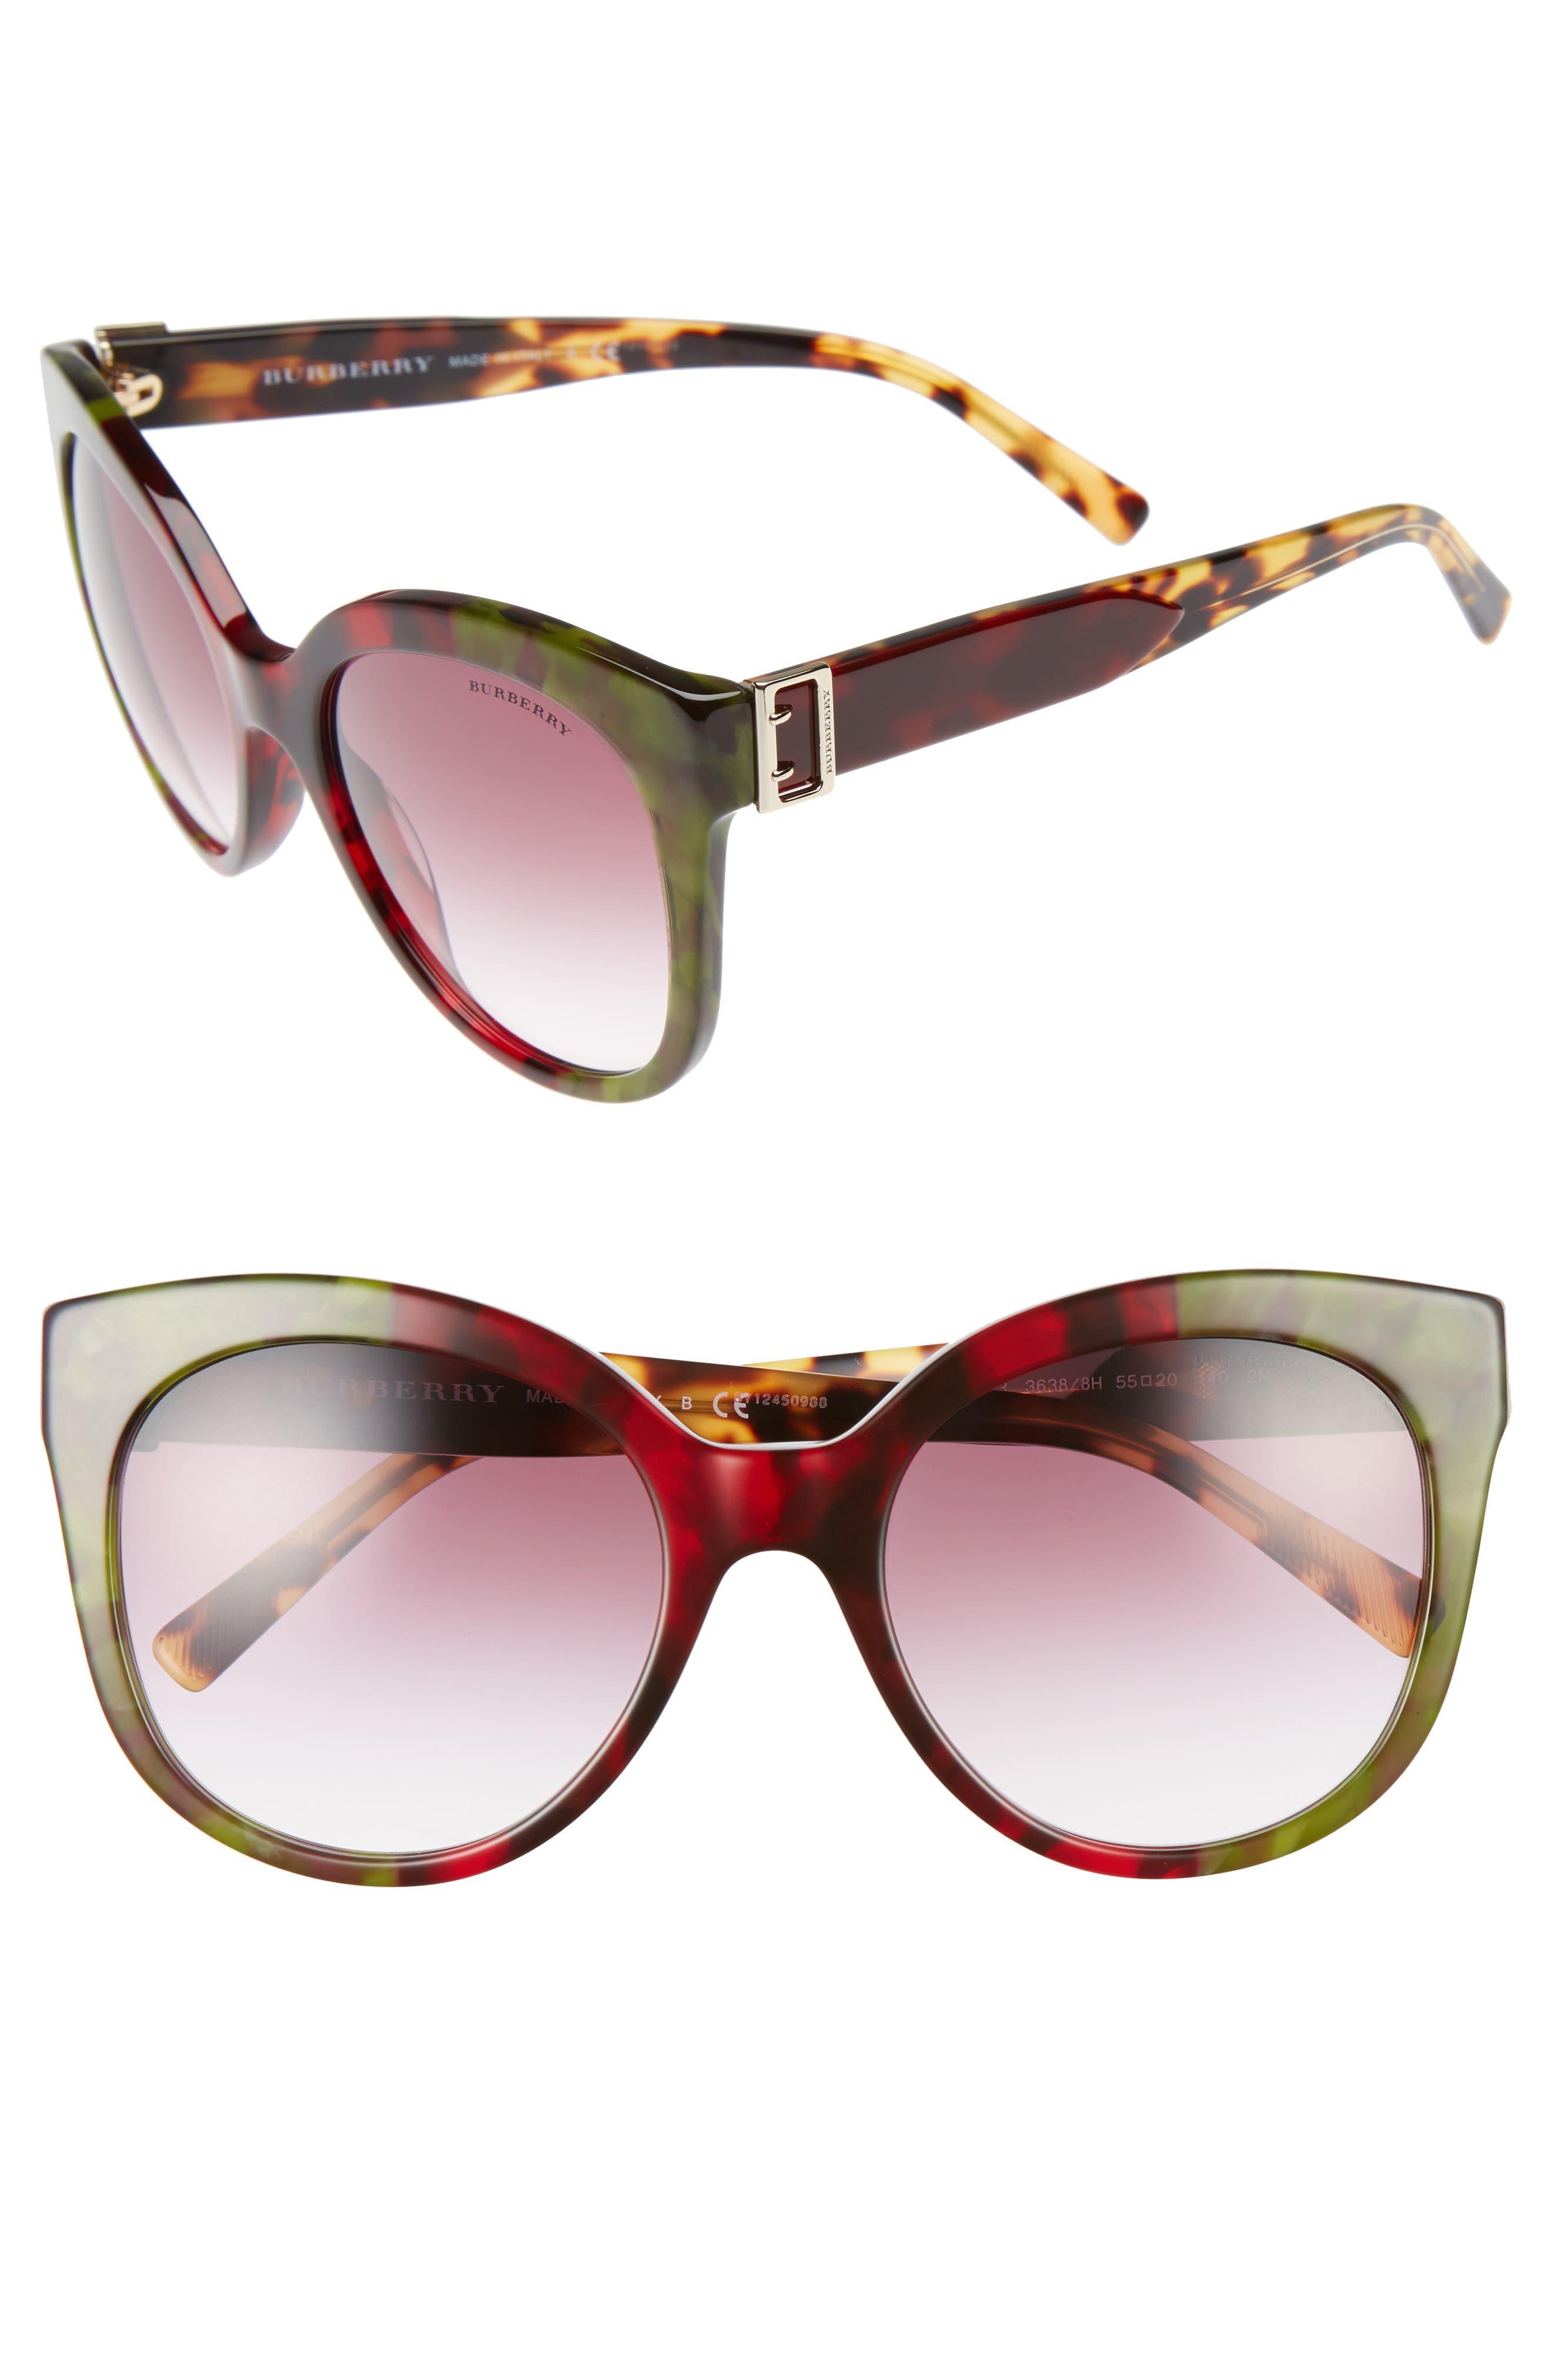 Burberry 55mm Gradient Cat Eye Sunglasses